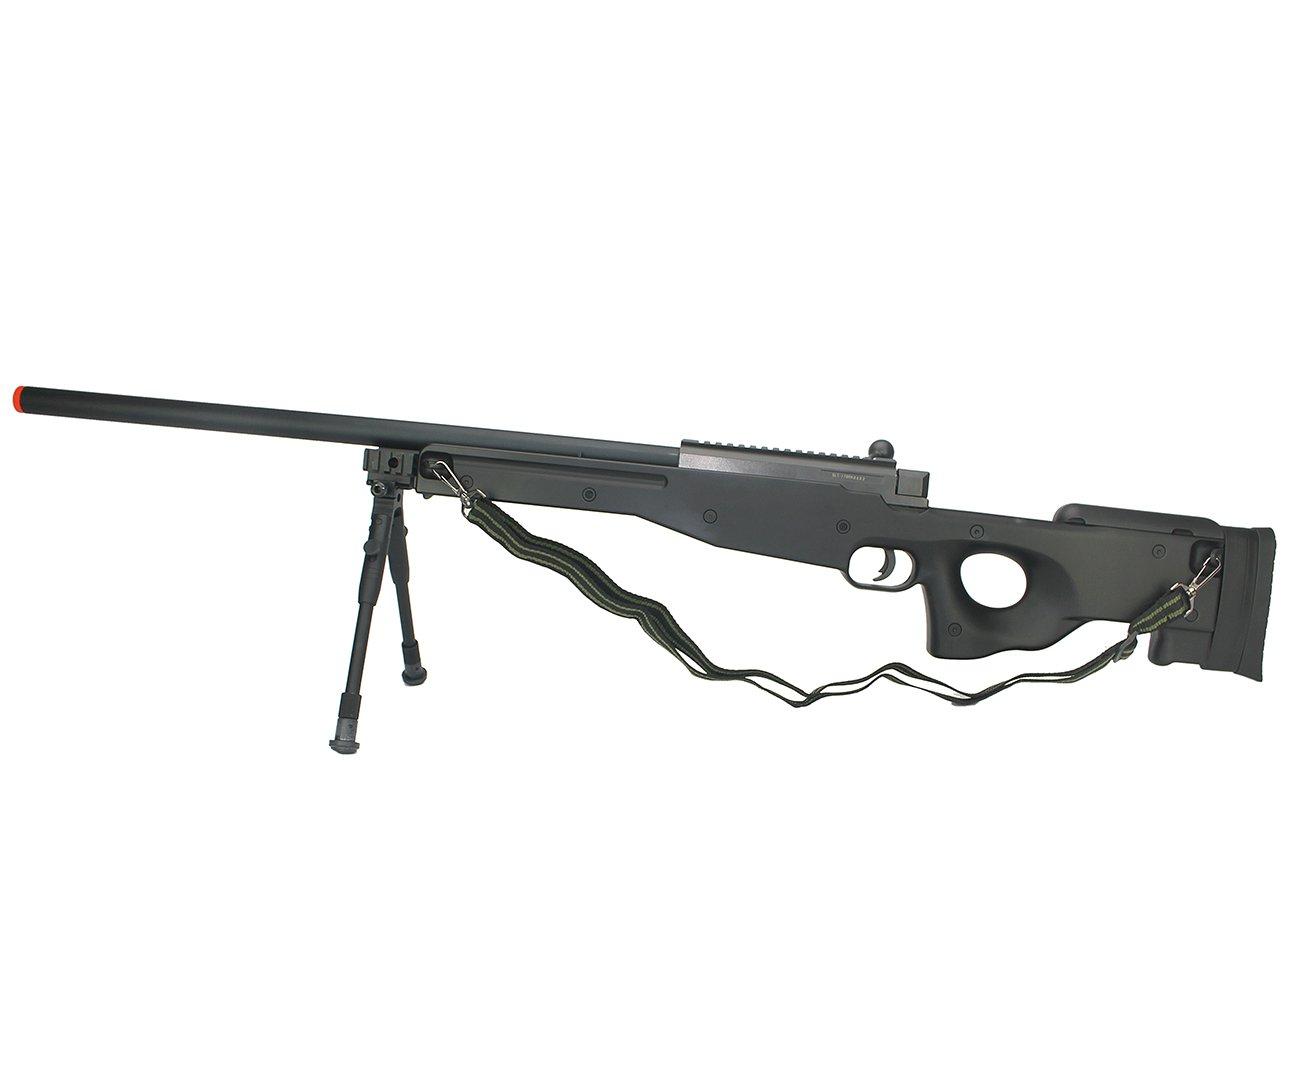 Rifle De Airsoft Sniper Gas Gbb G21c Com Bipé Cal 6.0mm Well